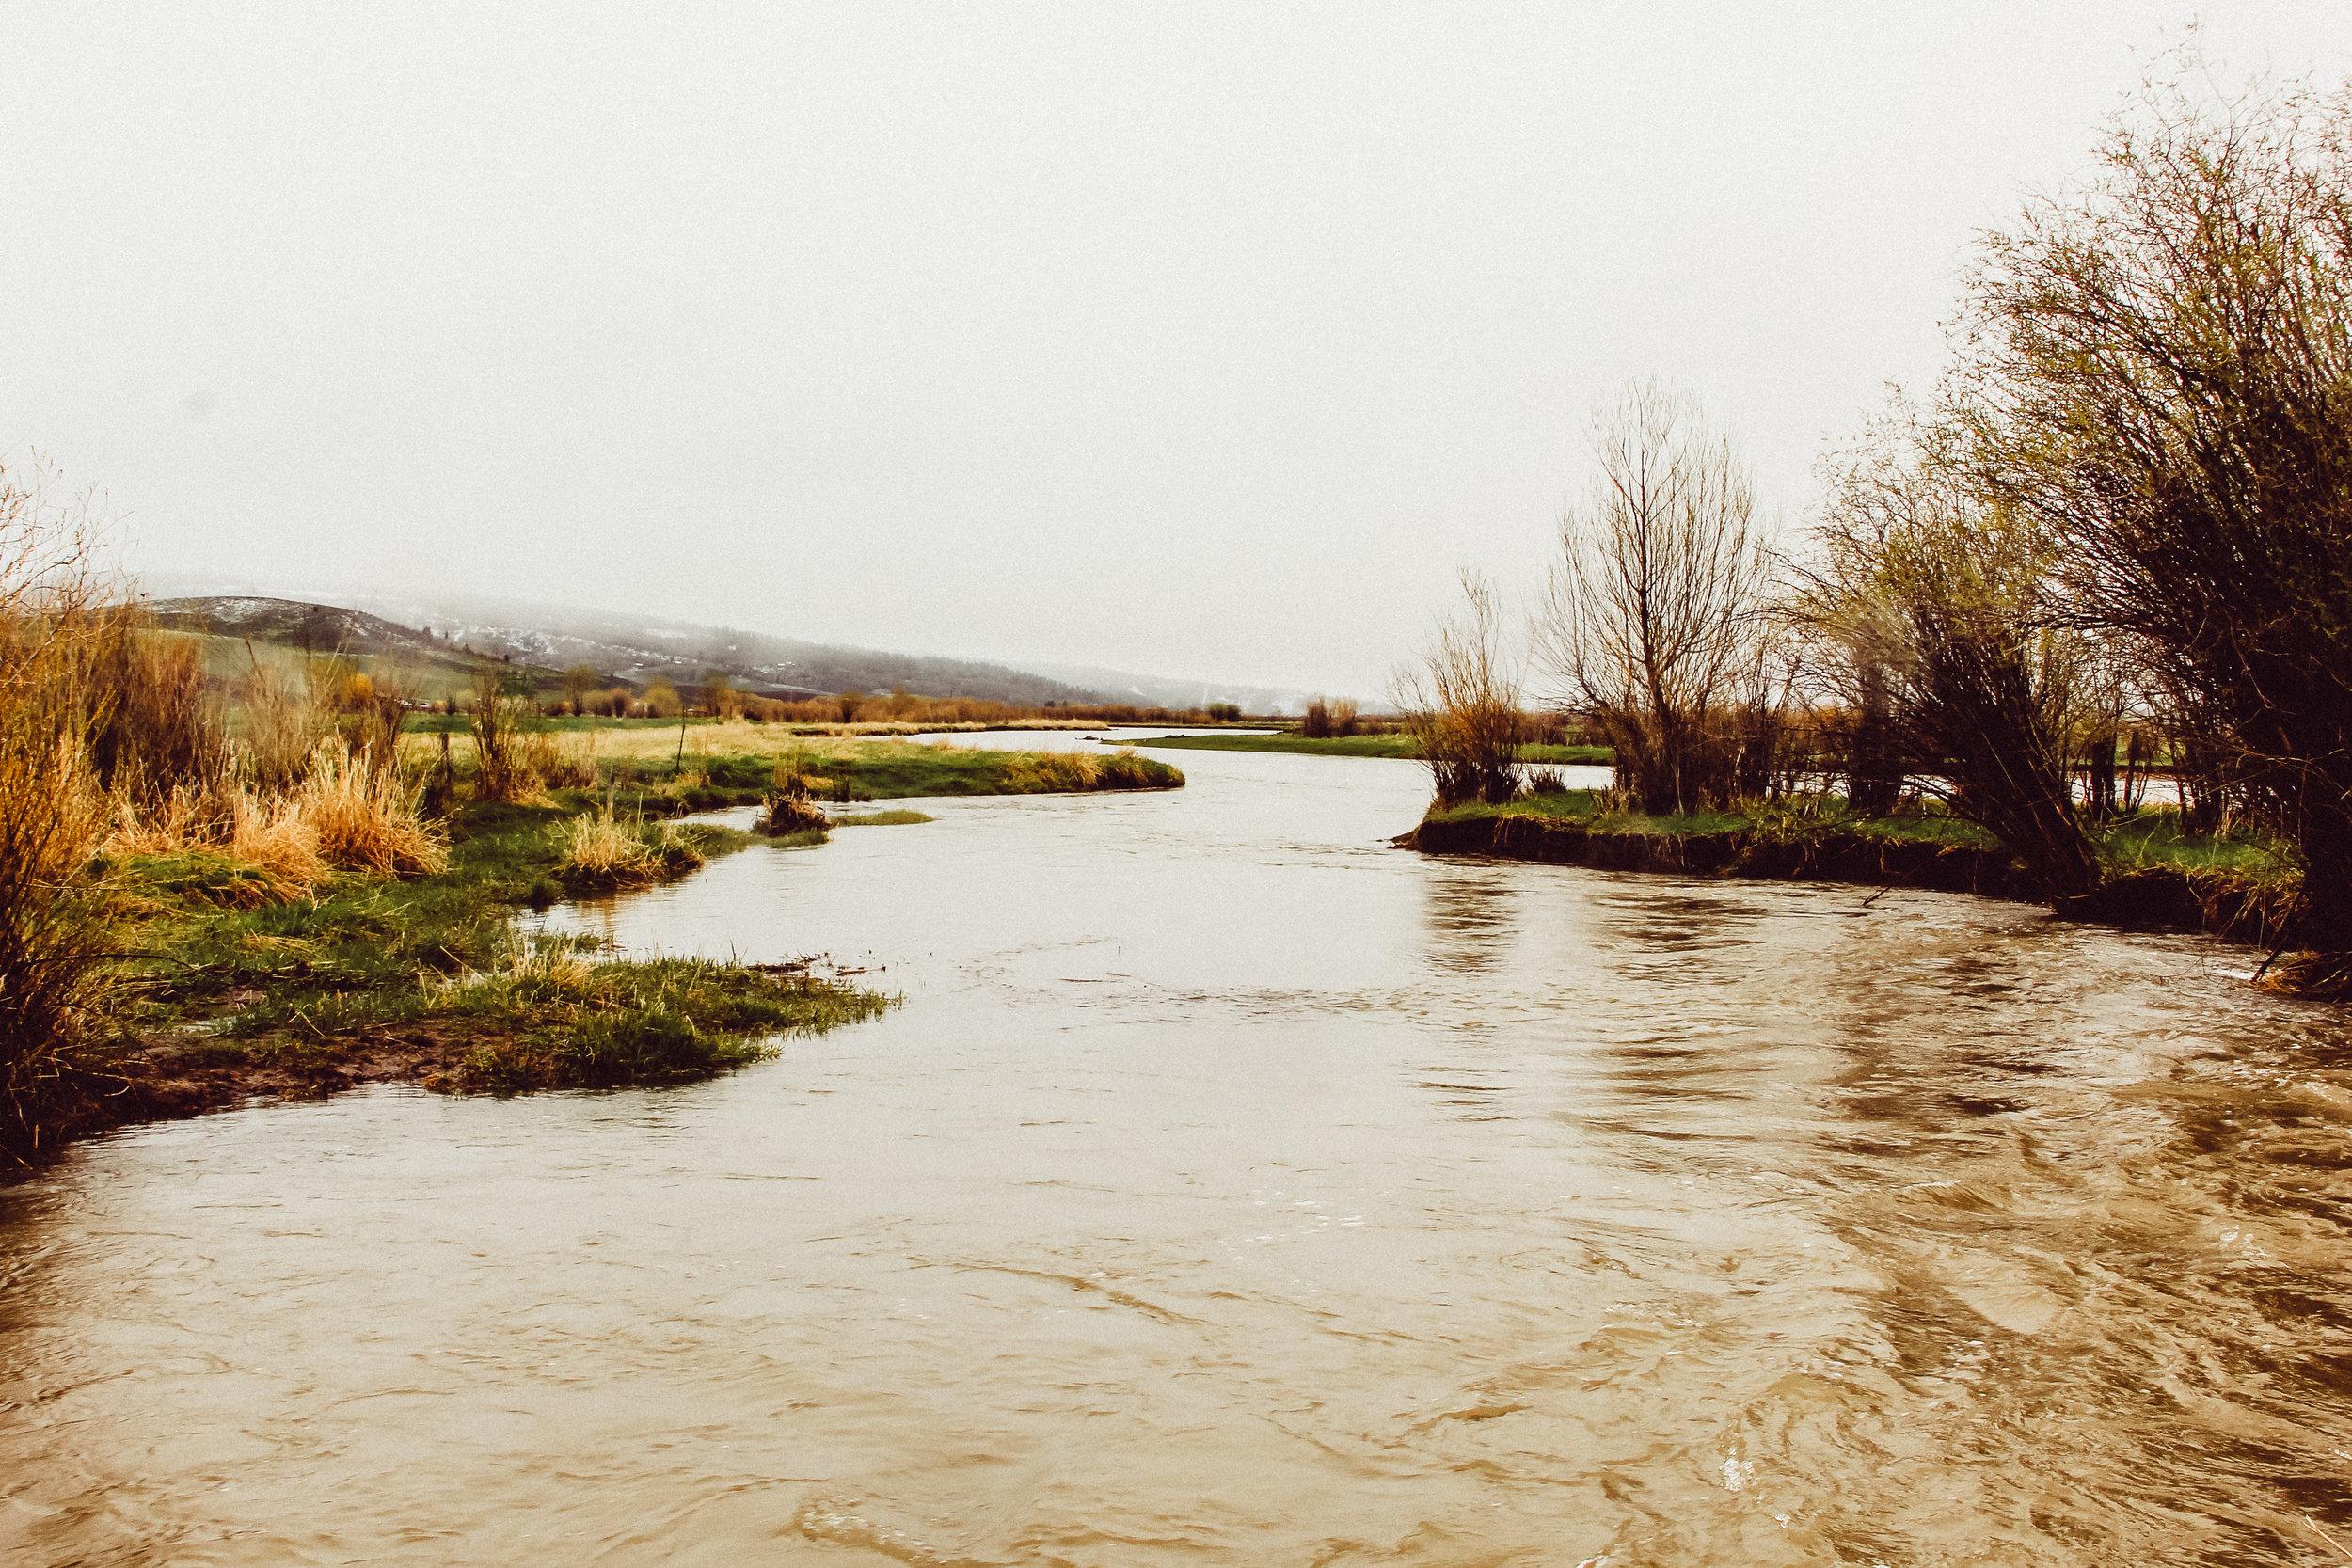 Jackknife Creek connecting to the Salt River